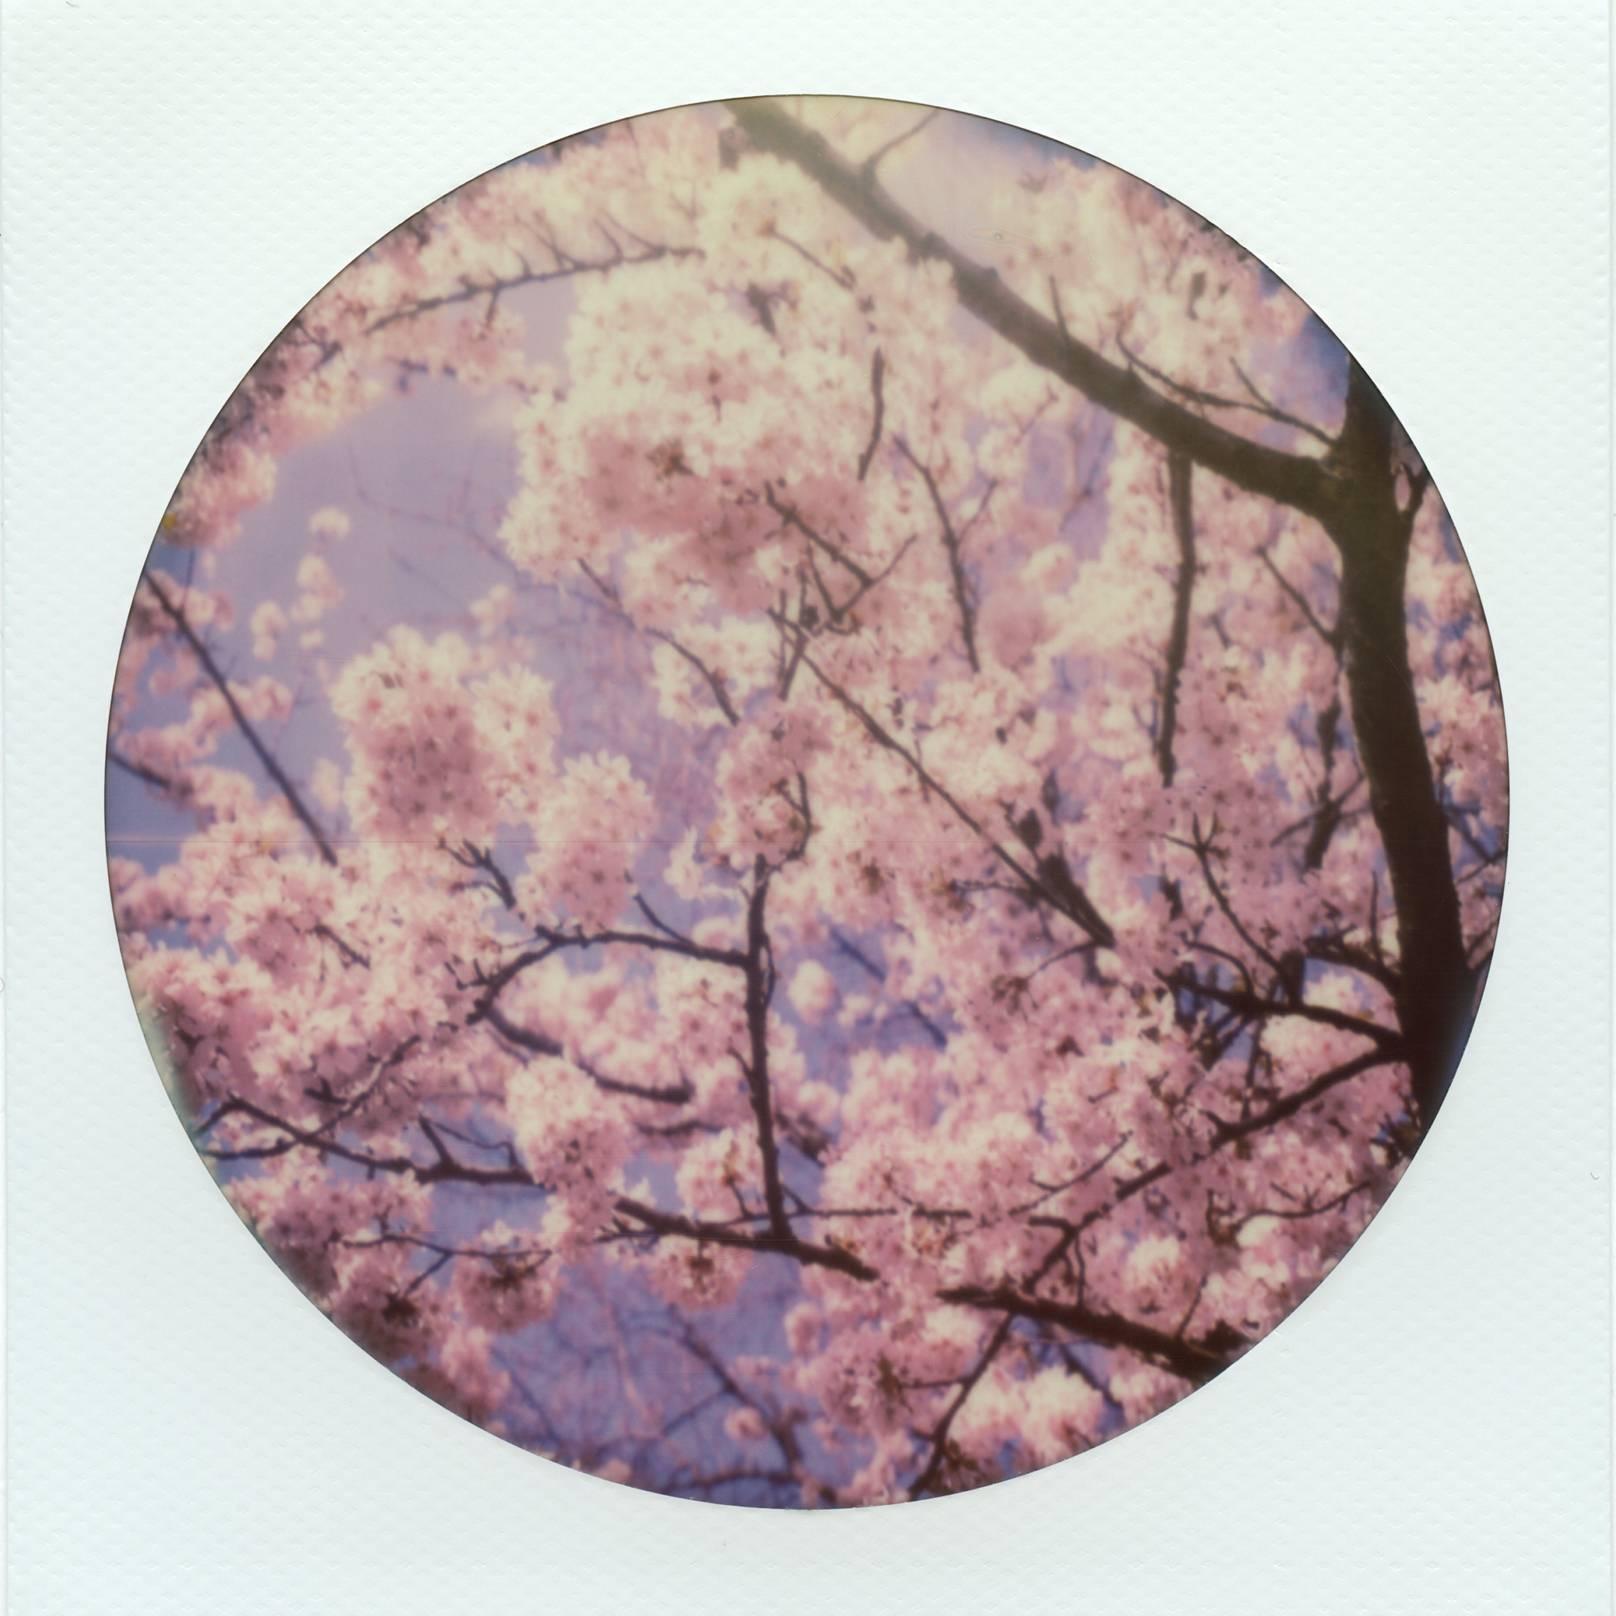 Cherry Blossoms IV - Polaroid, Contemporary, 21st Century